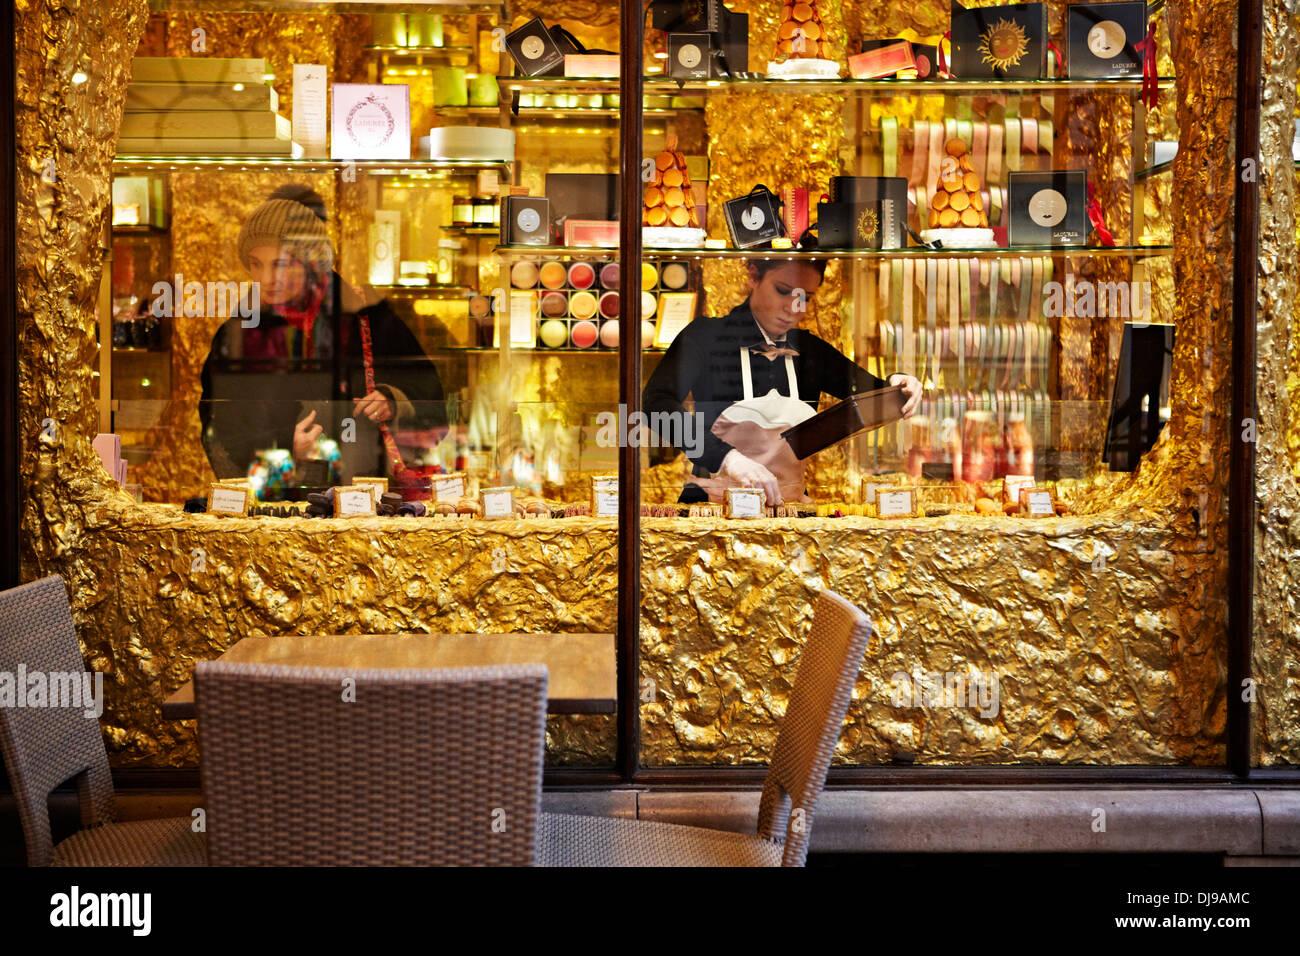 Royal Arcade, London, England, UK,, Christmas, Shopping, Winter Stock Photo